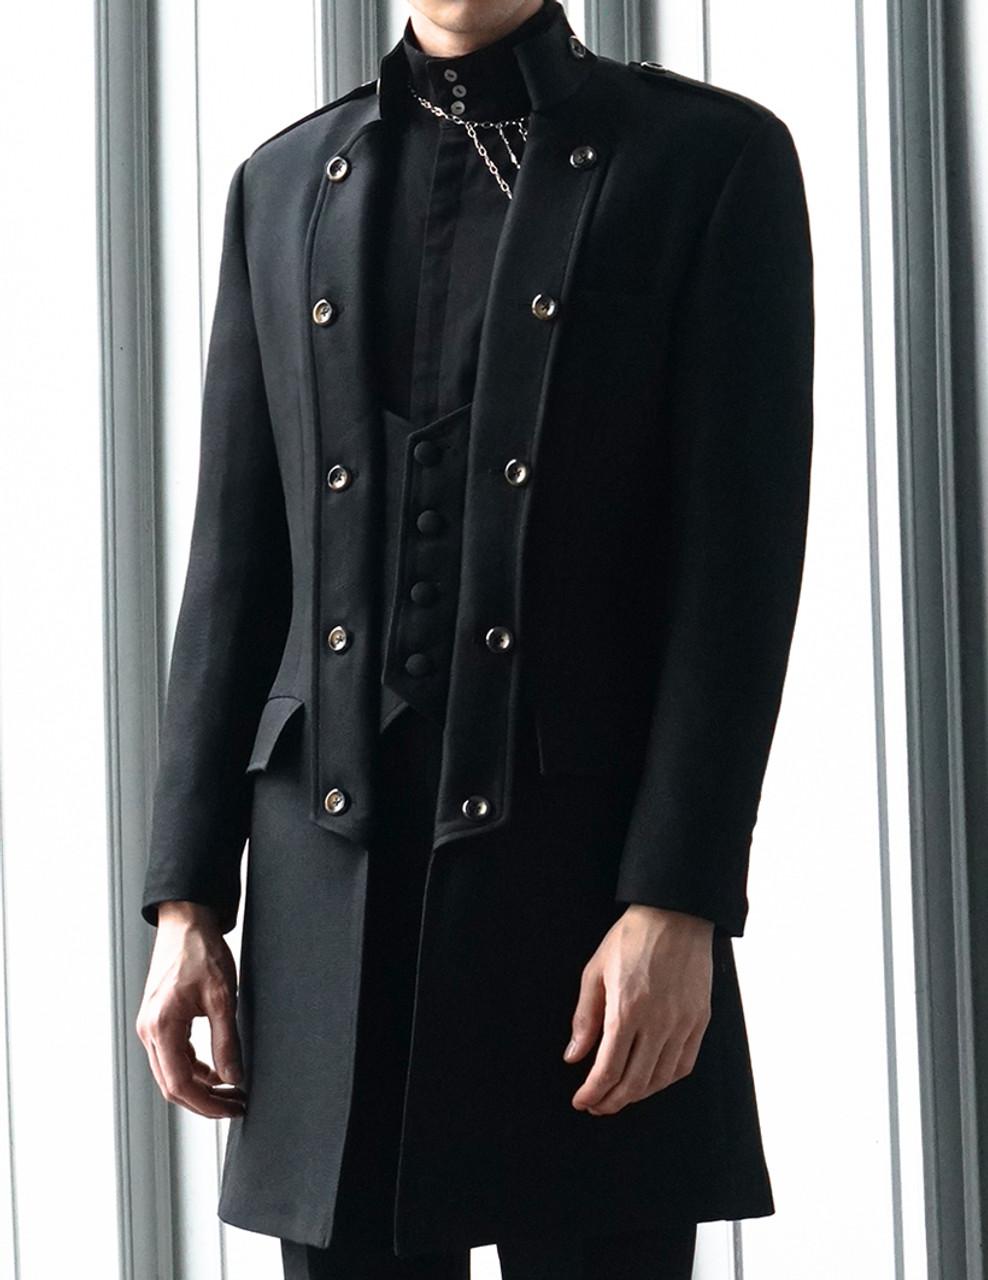 Mens khaki jacket casual - Mens Khaki Jacket Casual 50